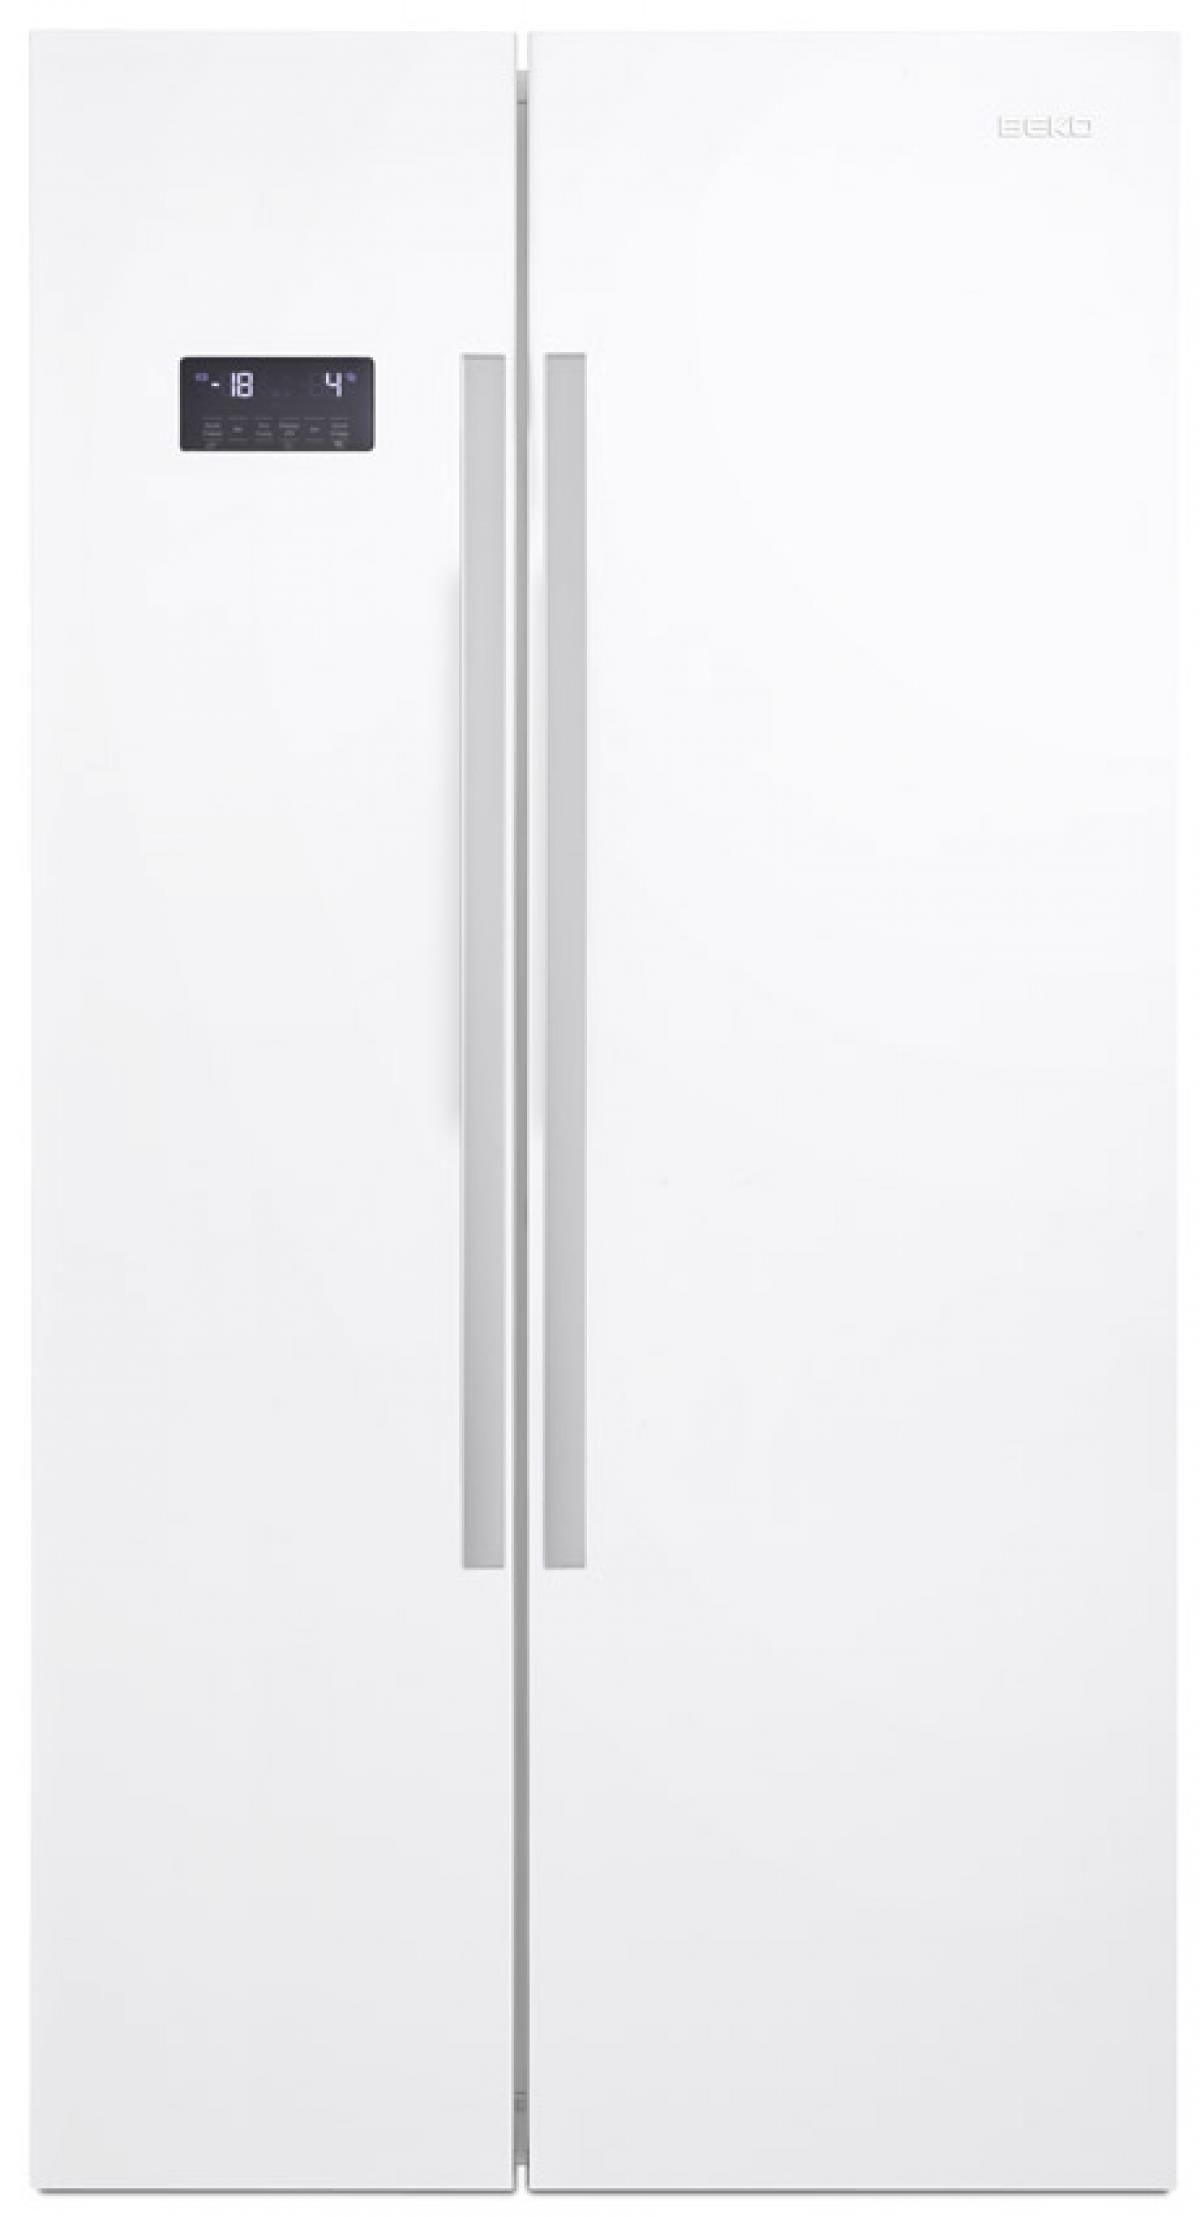 Beko GN1631120S Frigorifero Side by Side Capacita' 635 Litri Classe energetica A+ 182 cm Silver